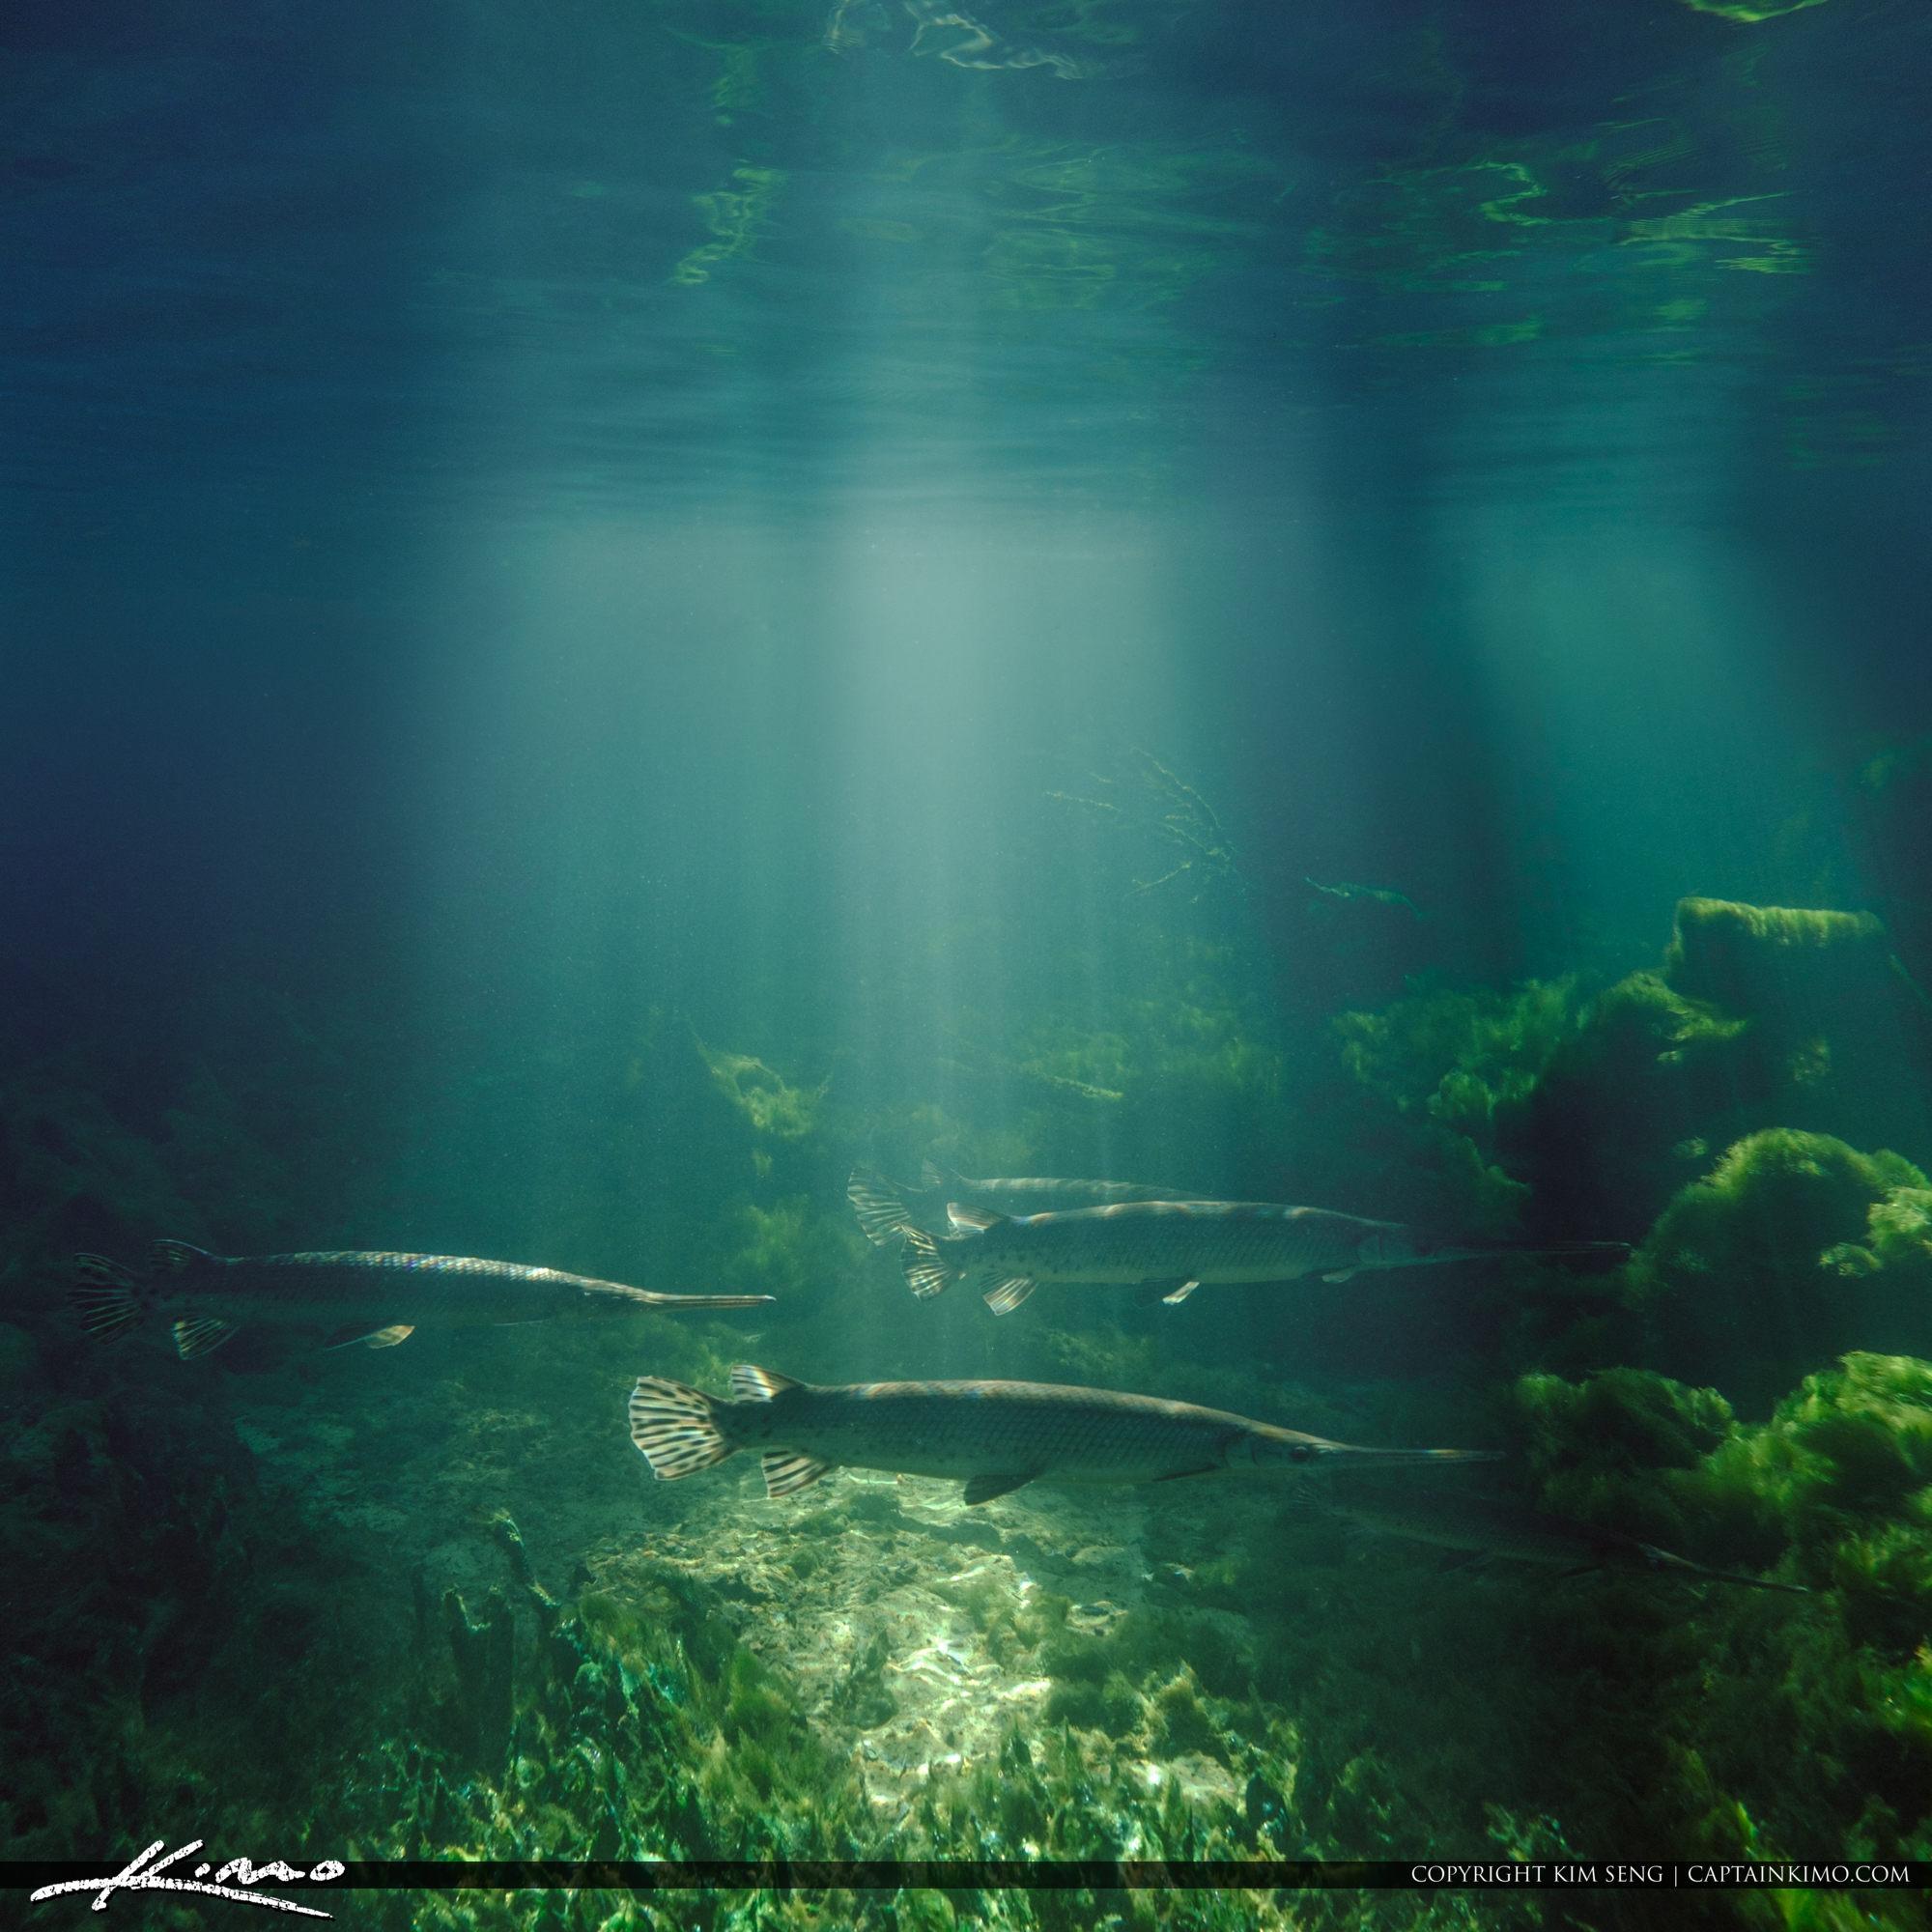 Blue Springs State Park Underwater with Alligator Gars